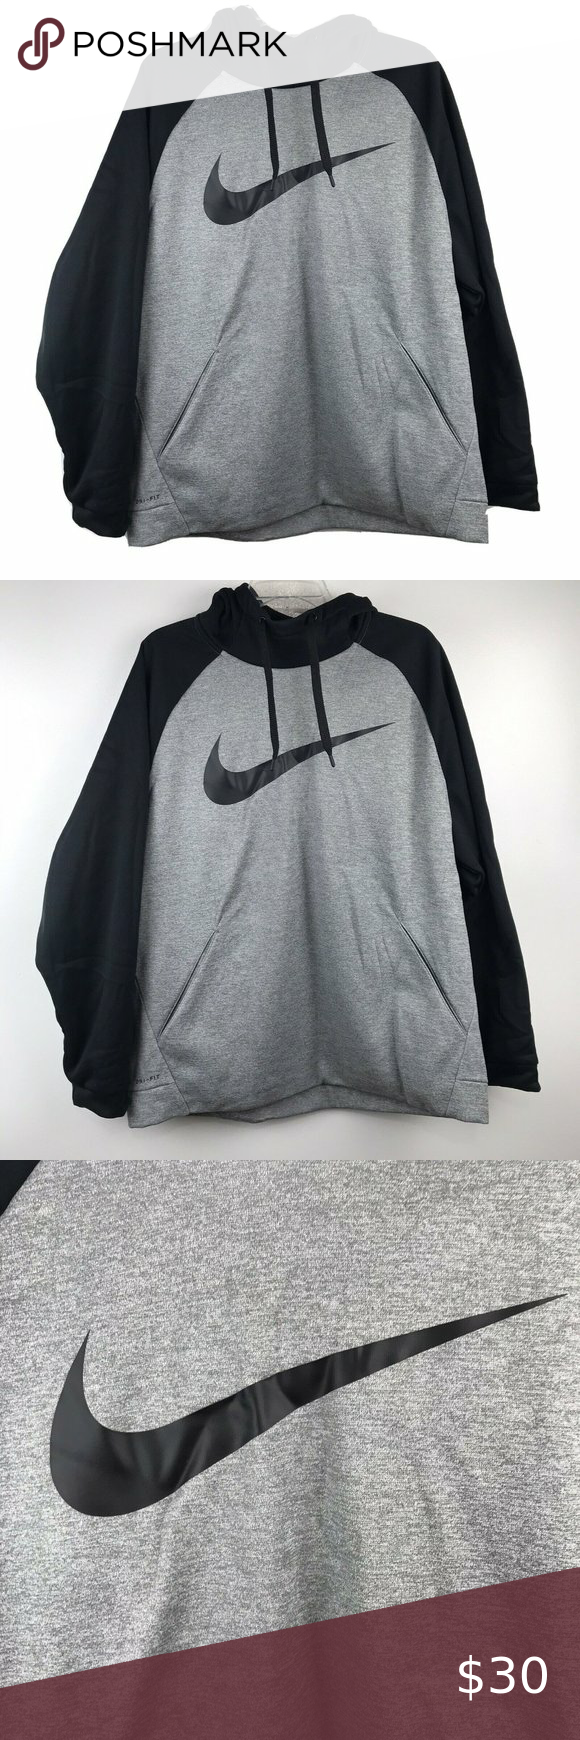 Nike Dri Fit Hoodie Sweatshirt Size Mens Xl From Nike Dri Fit Size Xl Laying Flat It Measures Undera Nike Dri Fit Hoodie Sweatshirts Hoodie Workout Hoodie [ 1740 x 580 Pixel ]